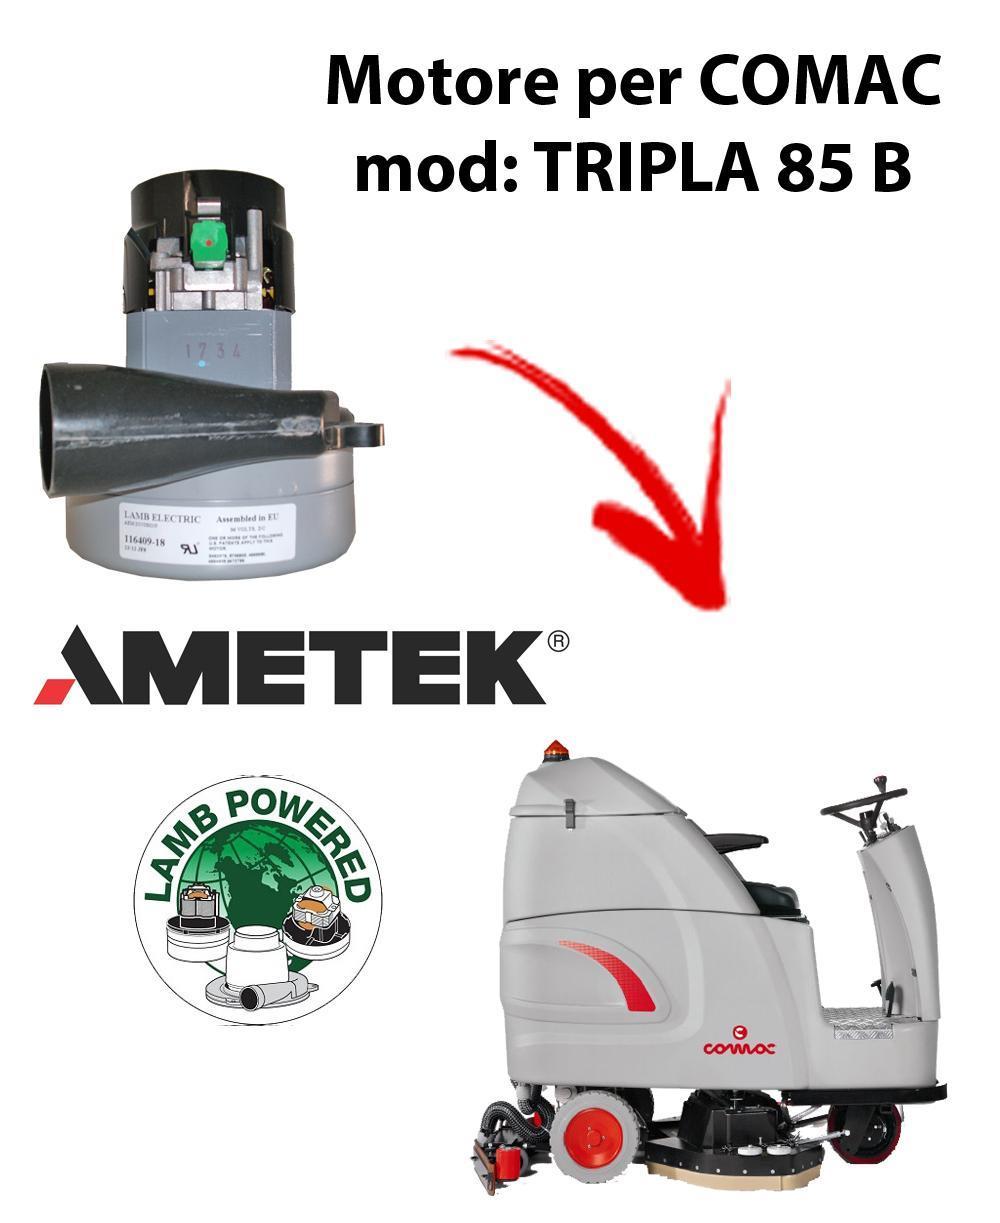 TRIPLA 85 B Motore de aspiración AMETEK para fregadora Comac